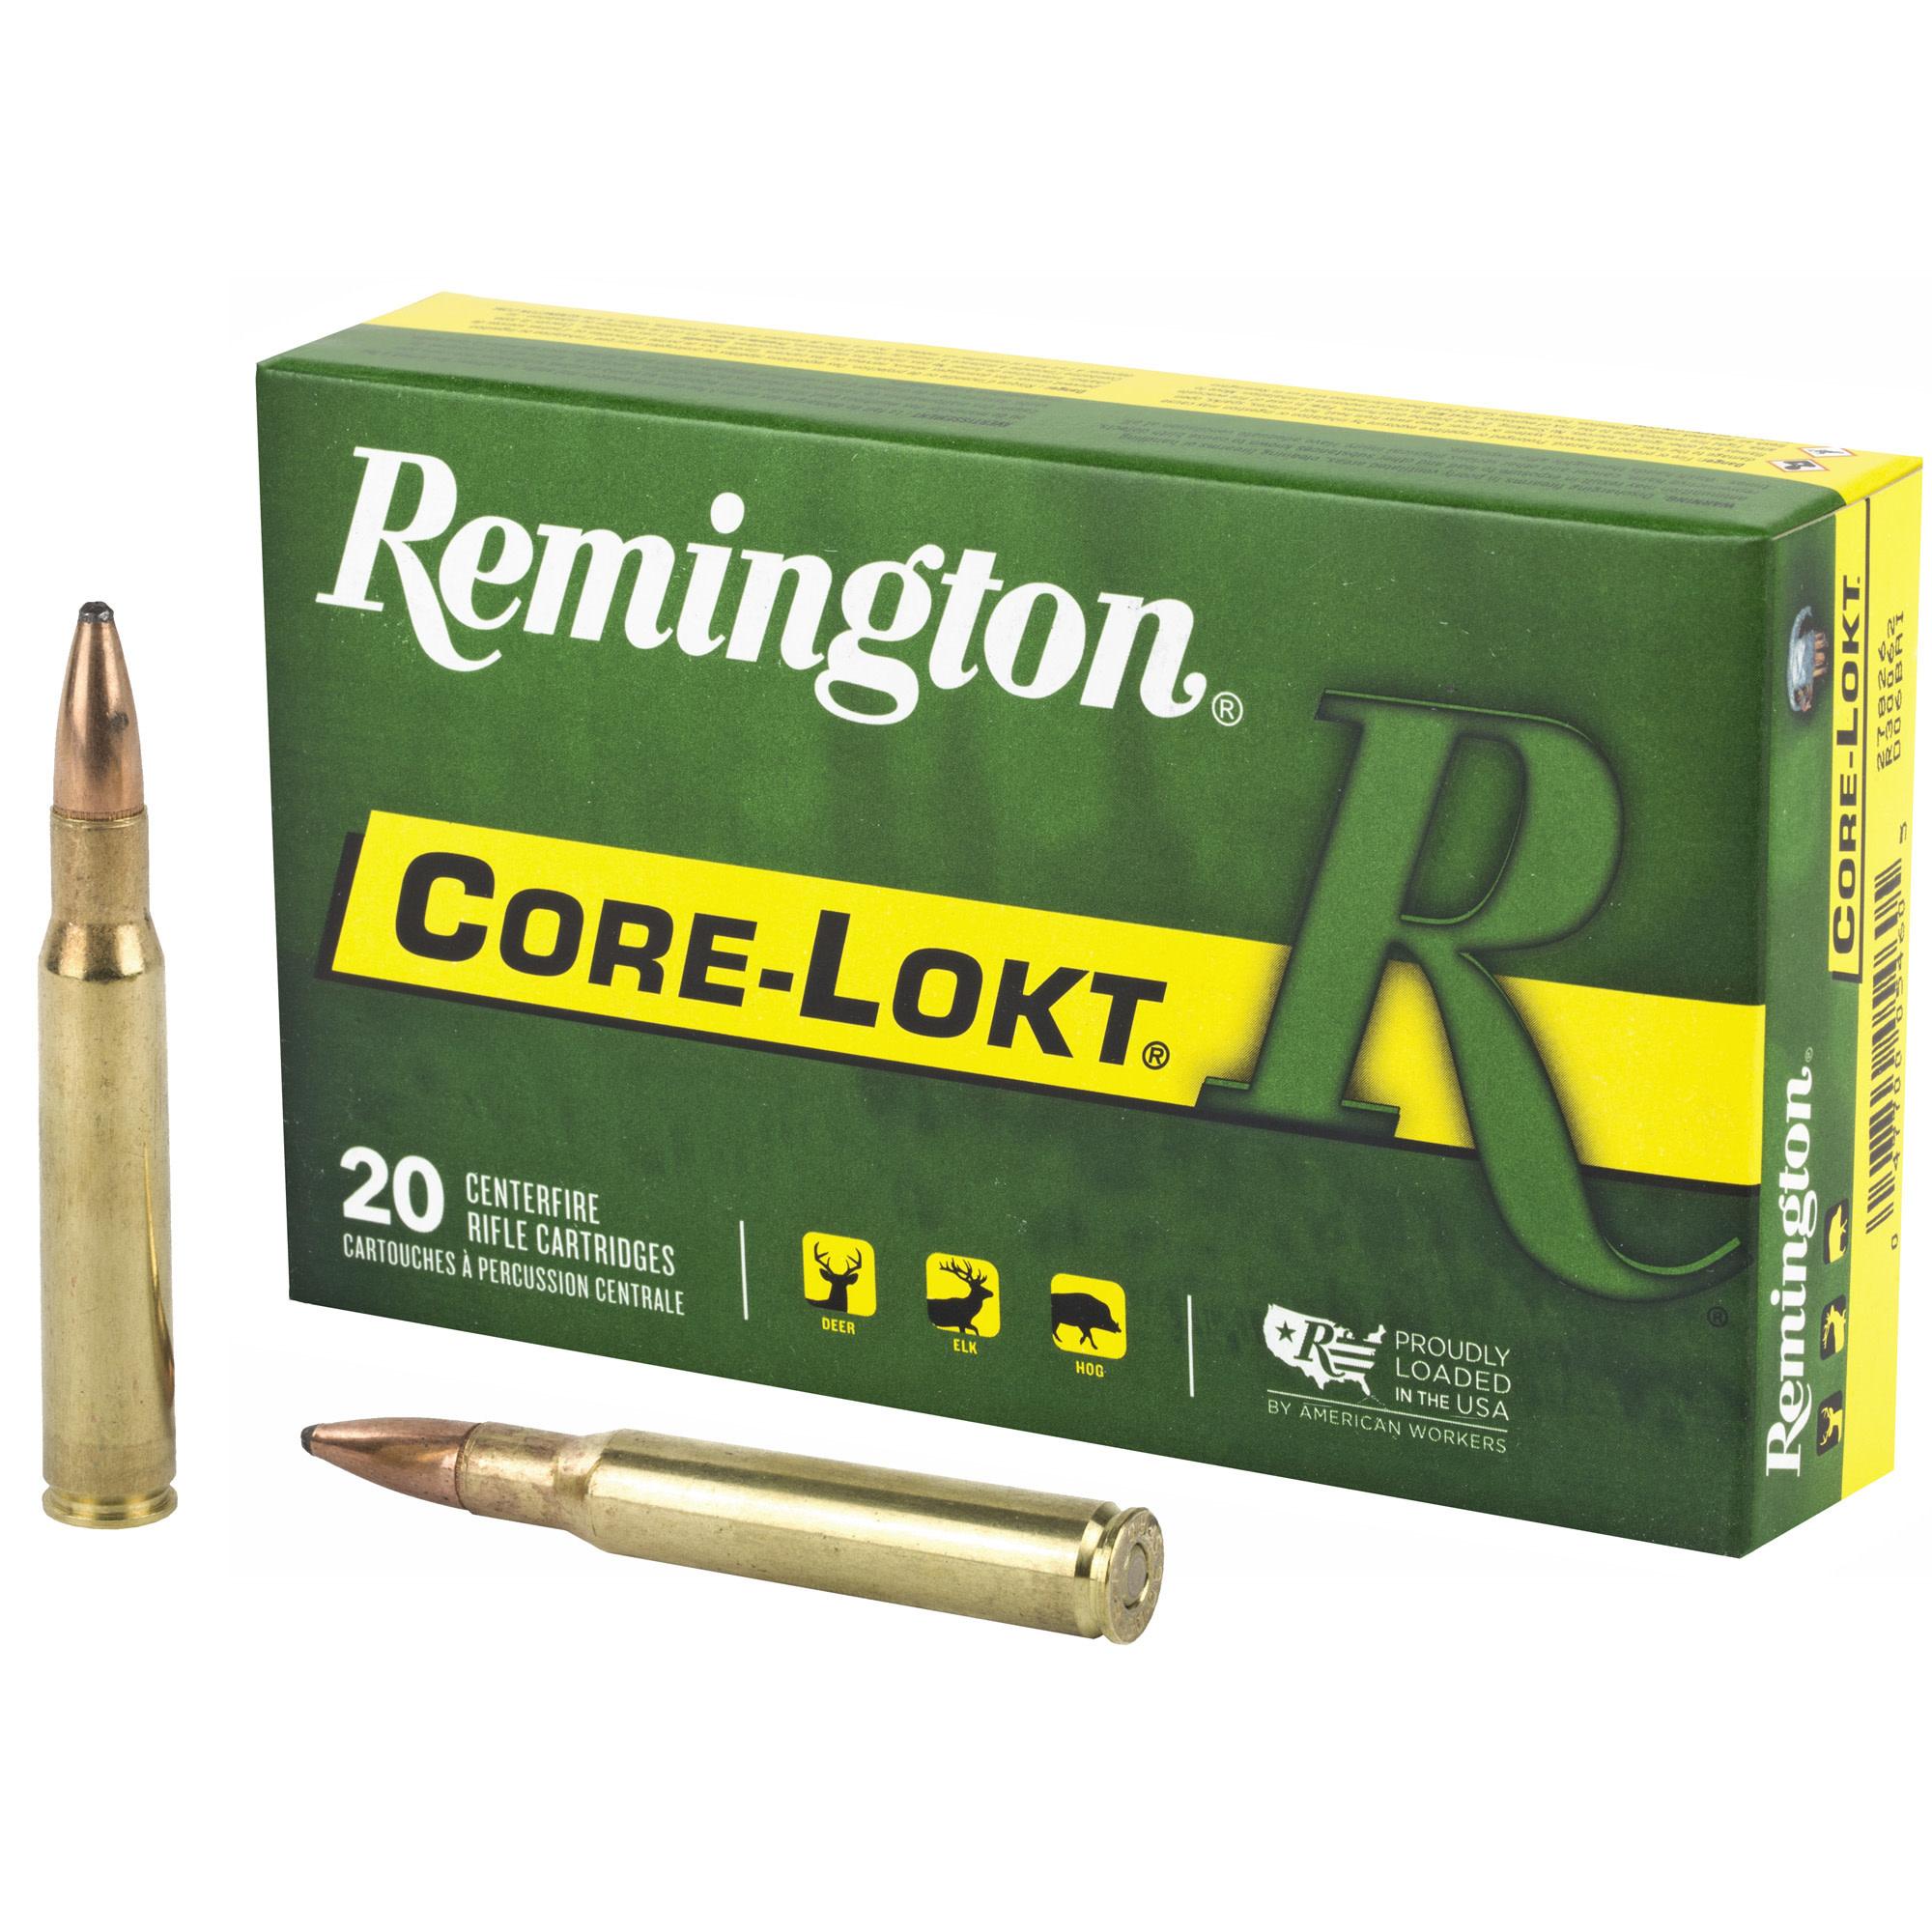 Ammo, Remington Core-Lokt, 30-06, 150 gr, Soft Point, 20 rd